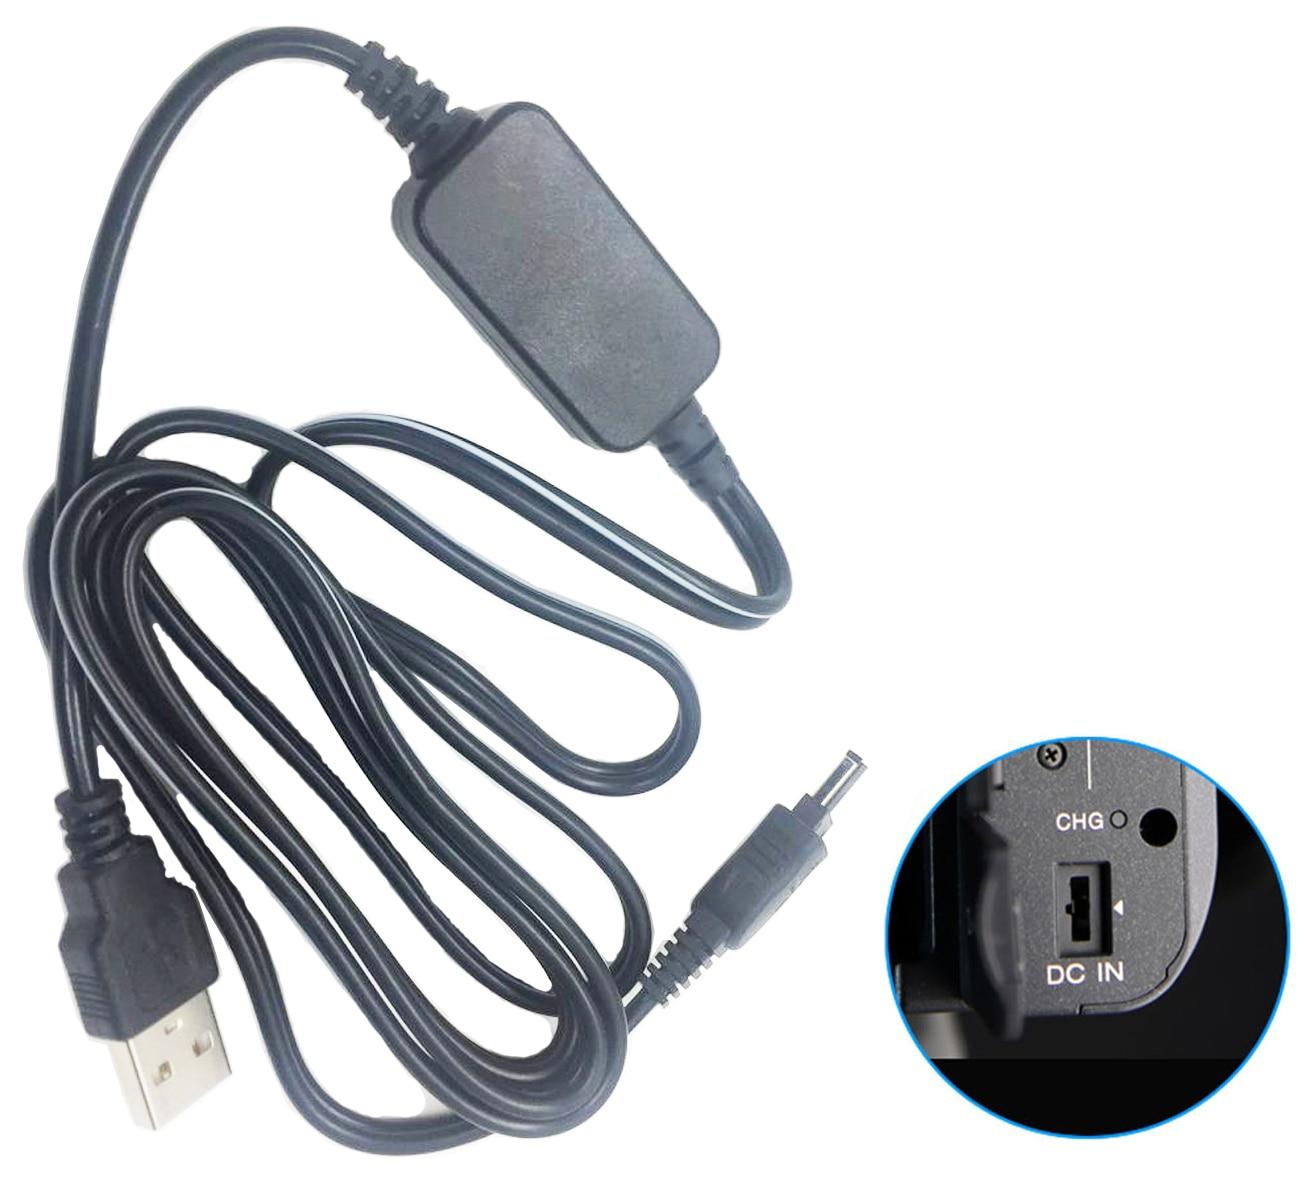 DCR-TRV530 Handycam Camcorder Micro USB Battery Charger for Sony DCR-TRV230 DCR-TRV430 DCR-TRV330